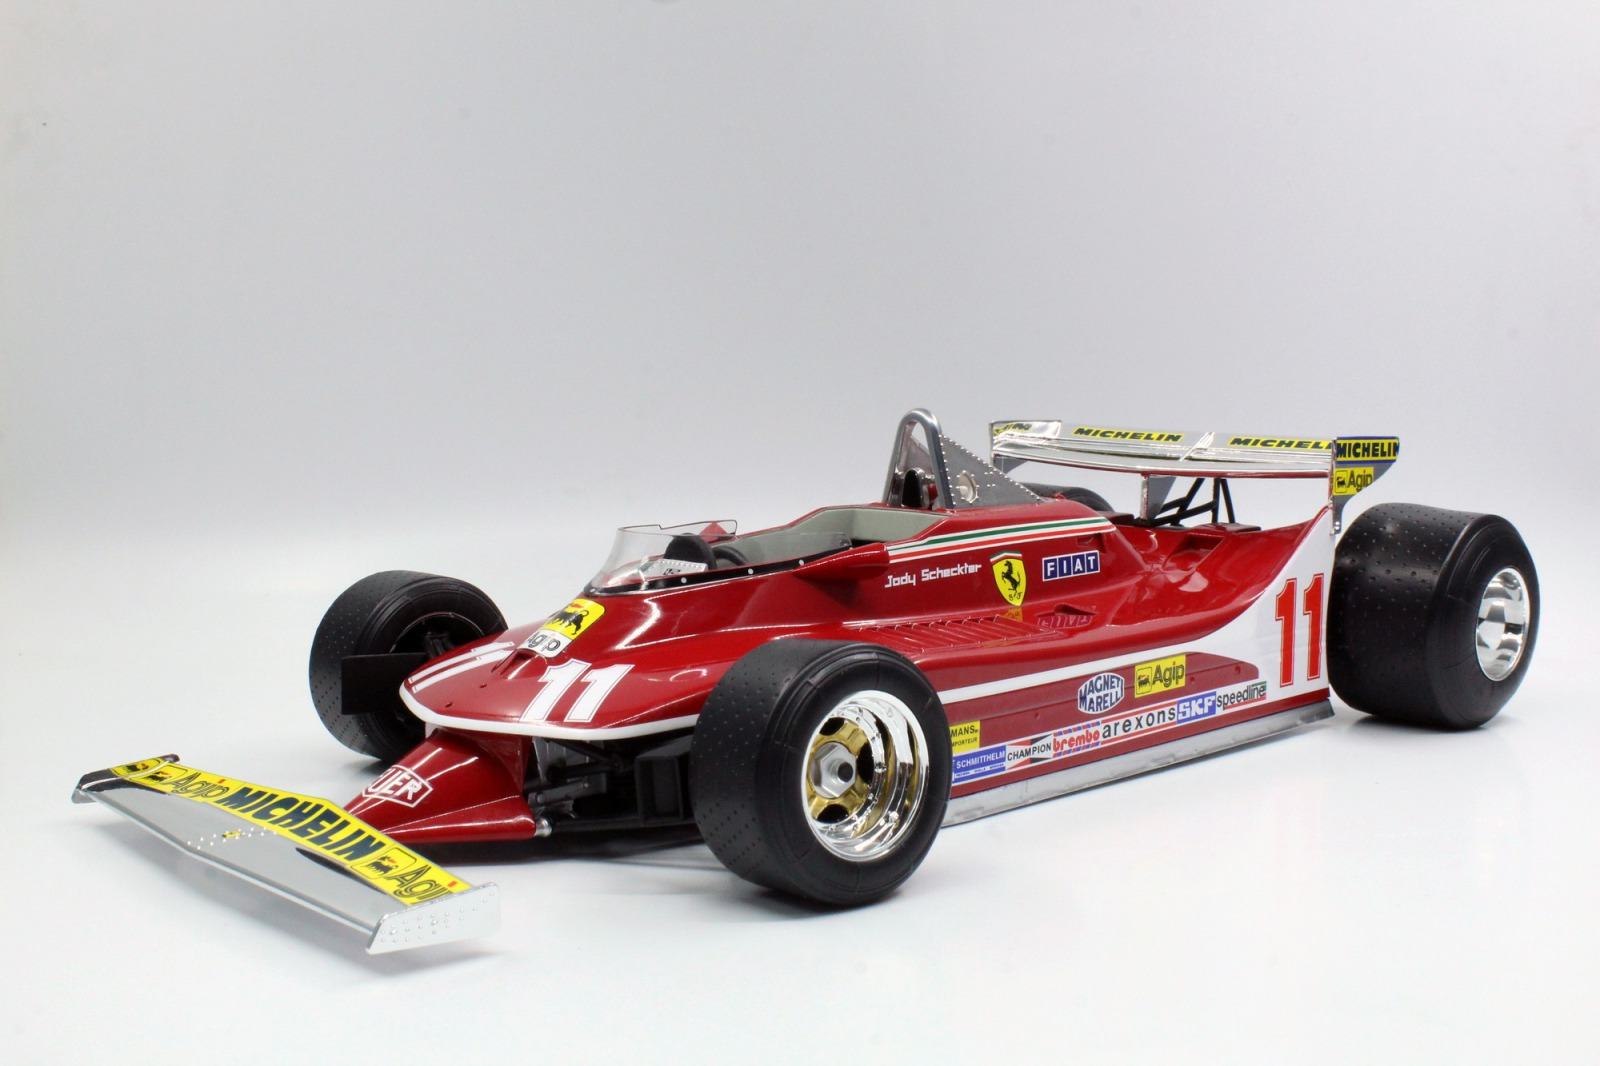 GP Replicas 1/12 ミニカー レジン プロポーションモデル 1979年ワールドチャンピオン フェラーリ F1 312T4 No.11 J.ScheckterFERRARI - F1 312T4 SHORT TAIL N 11 J.SCHECKTER SEASON 1979 WORLD CHAMPION 1:12 GP Replicas